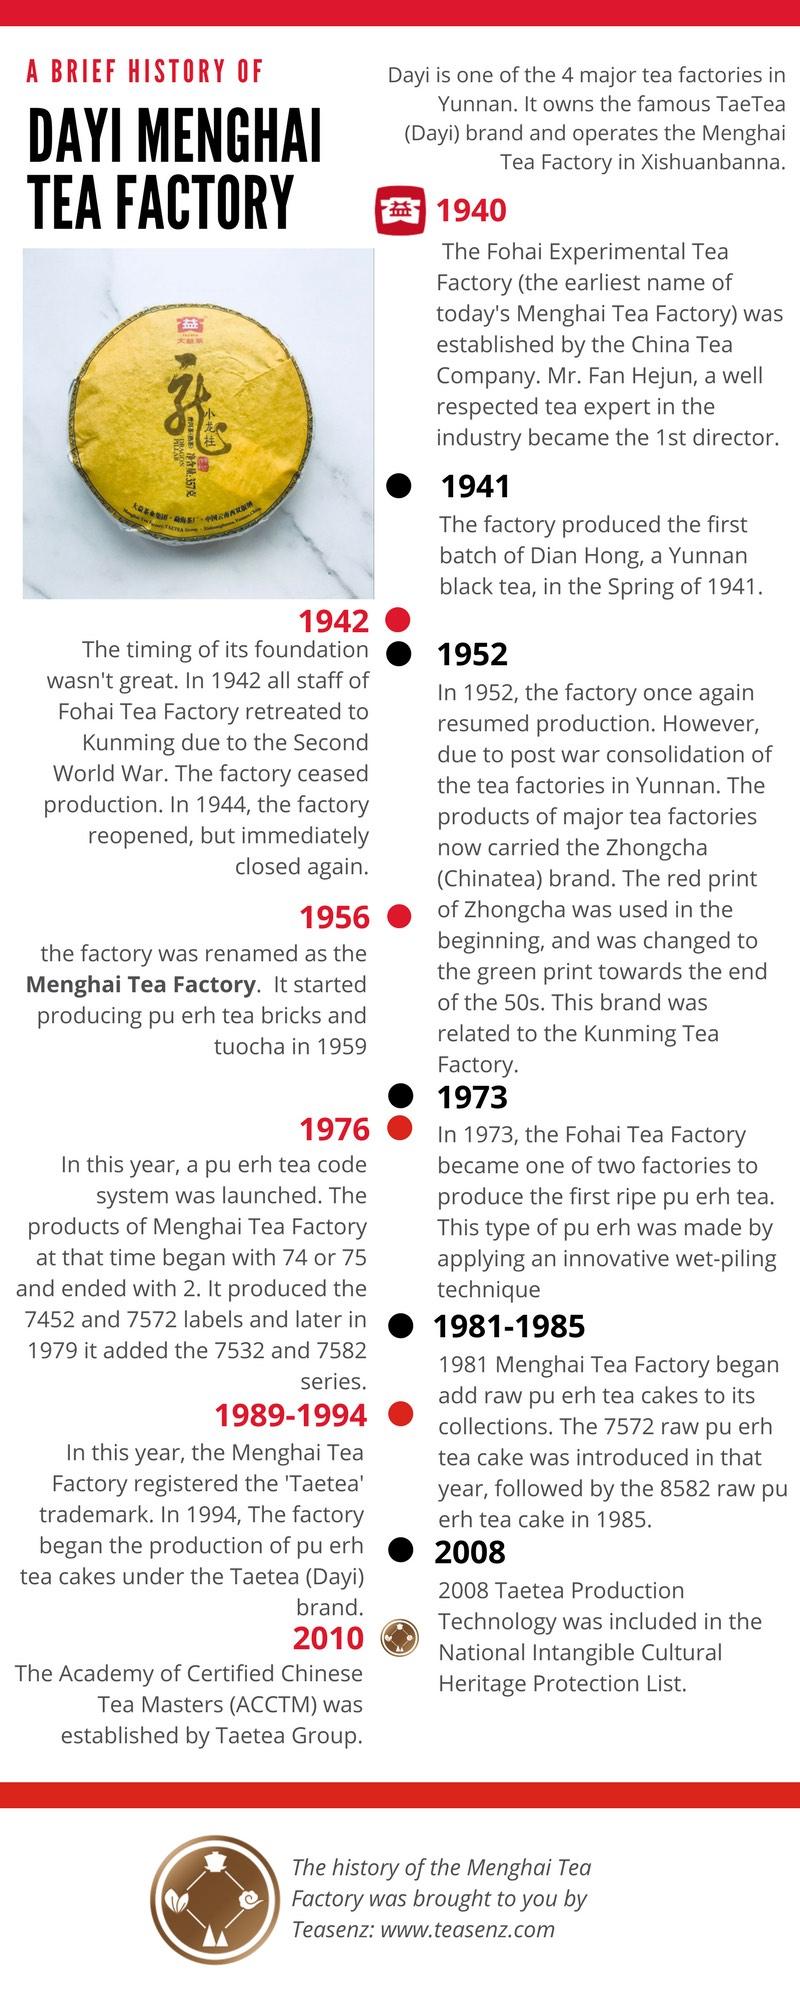 menghai tea factory dayi taetea history